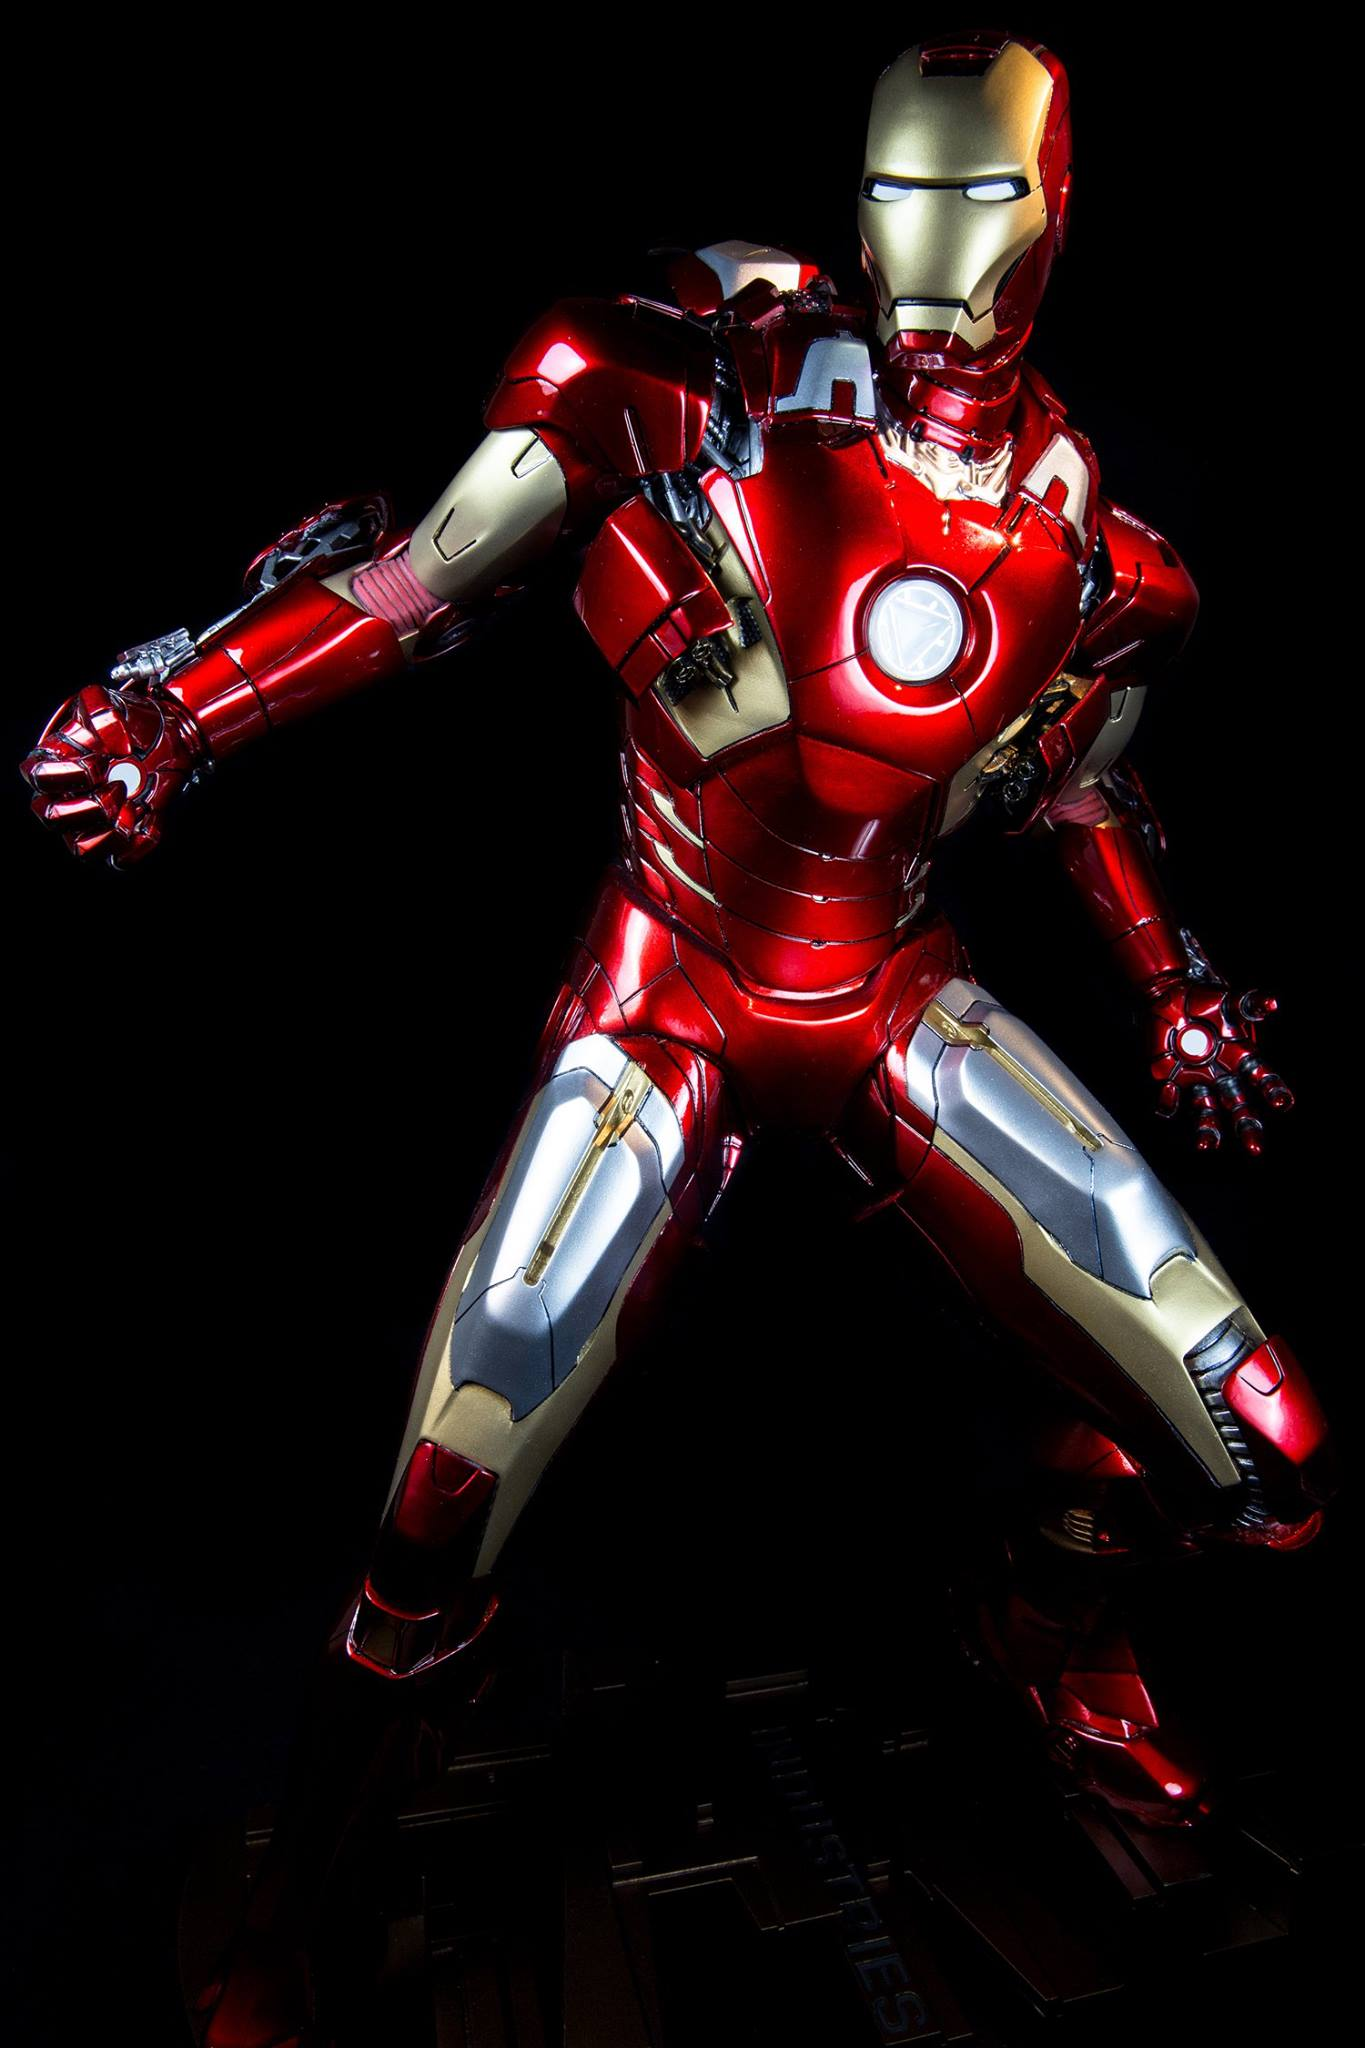 Premium Collectibles : Iron man MK VII - Page 2 9191281045443414035865898620368081687945474291567o